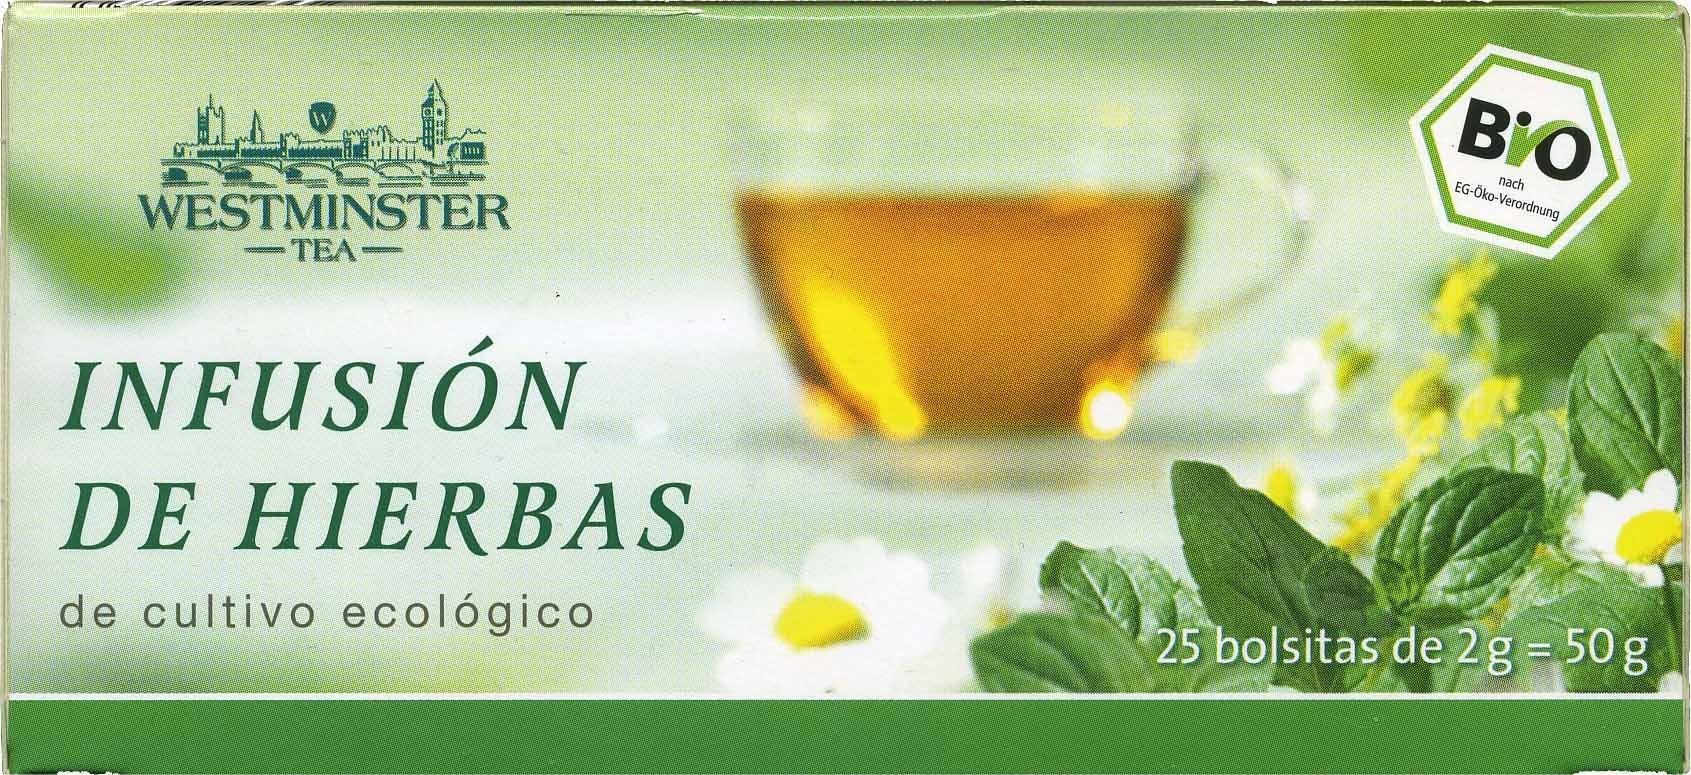 Infusión de hierbas en bolsitas - Produit